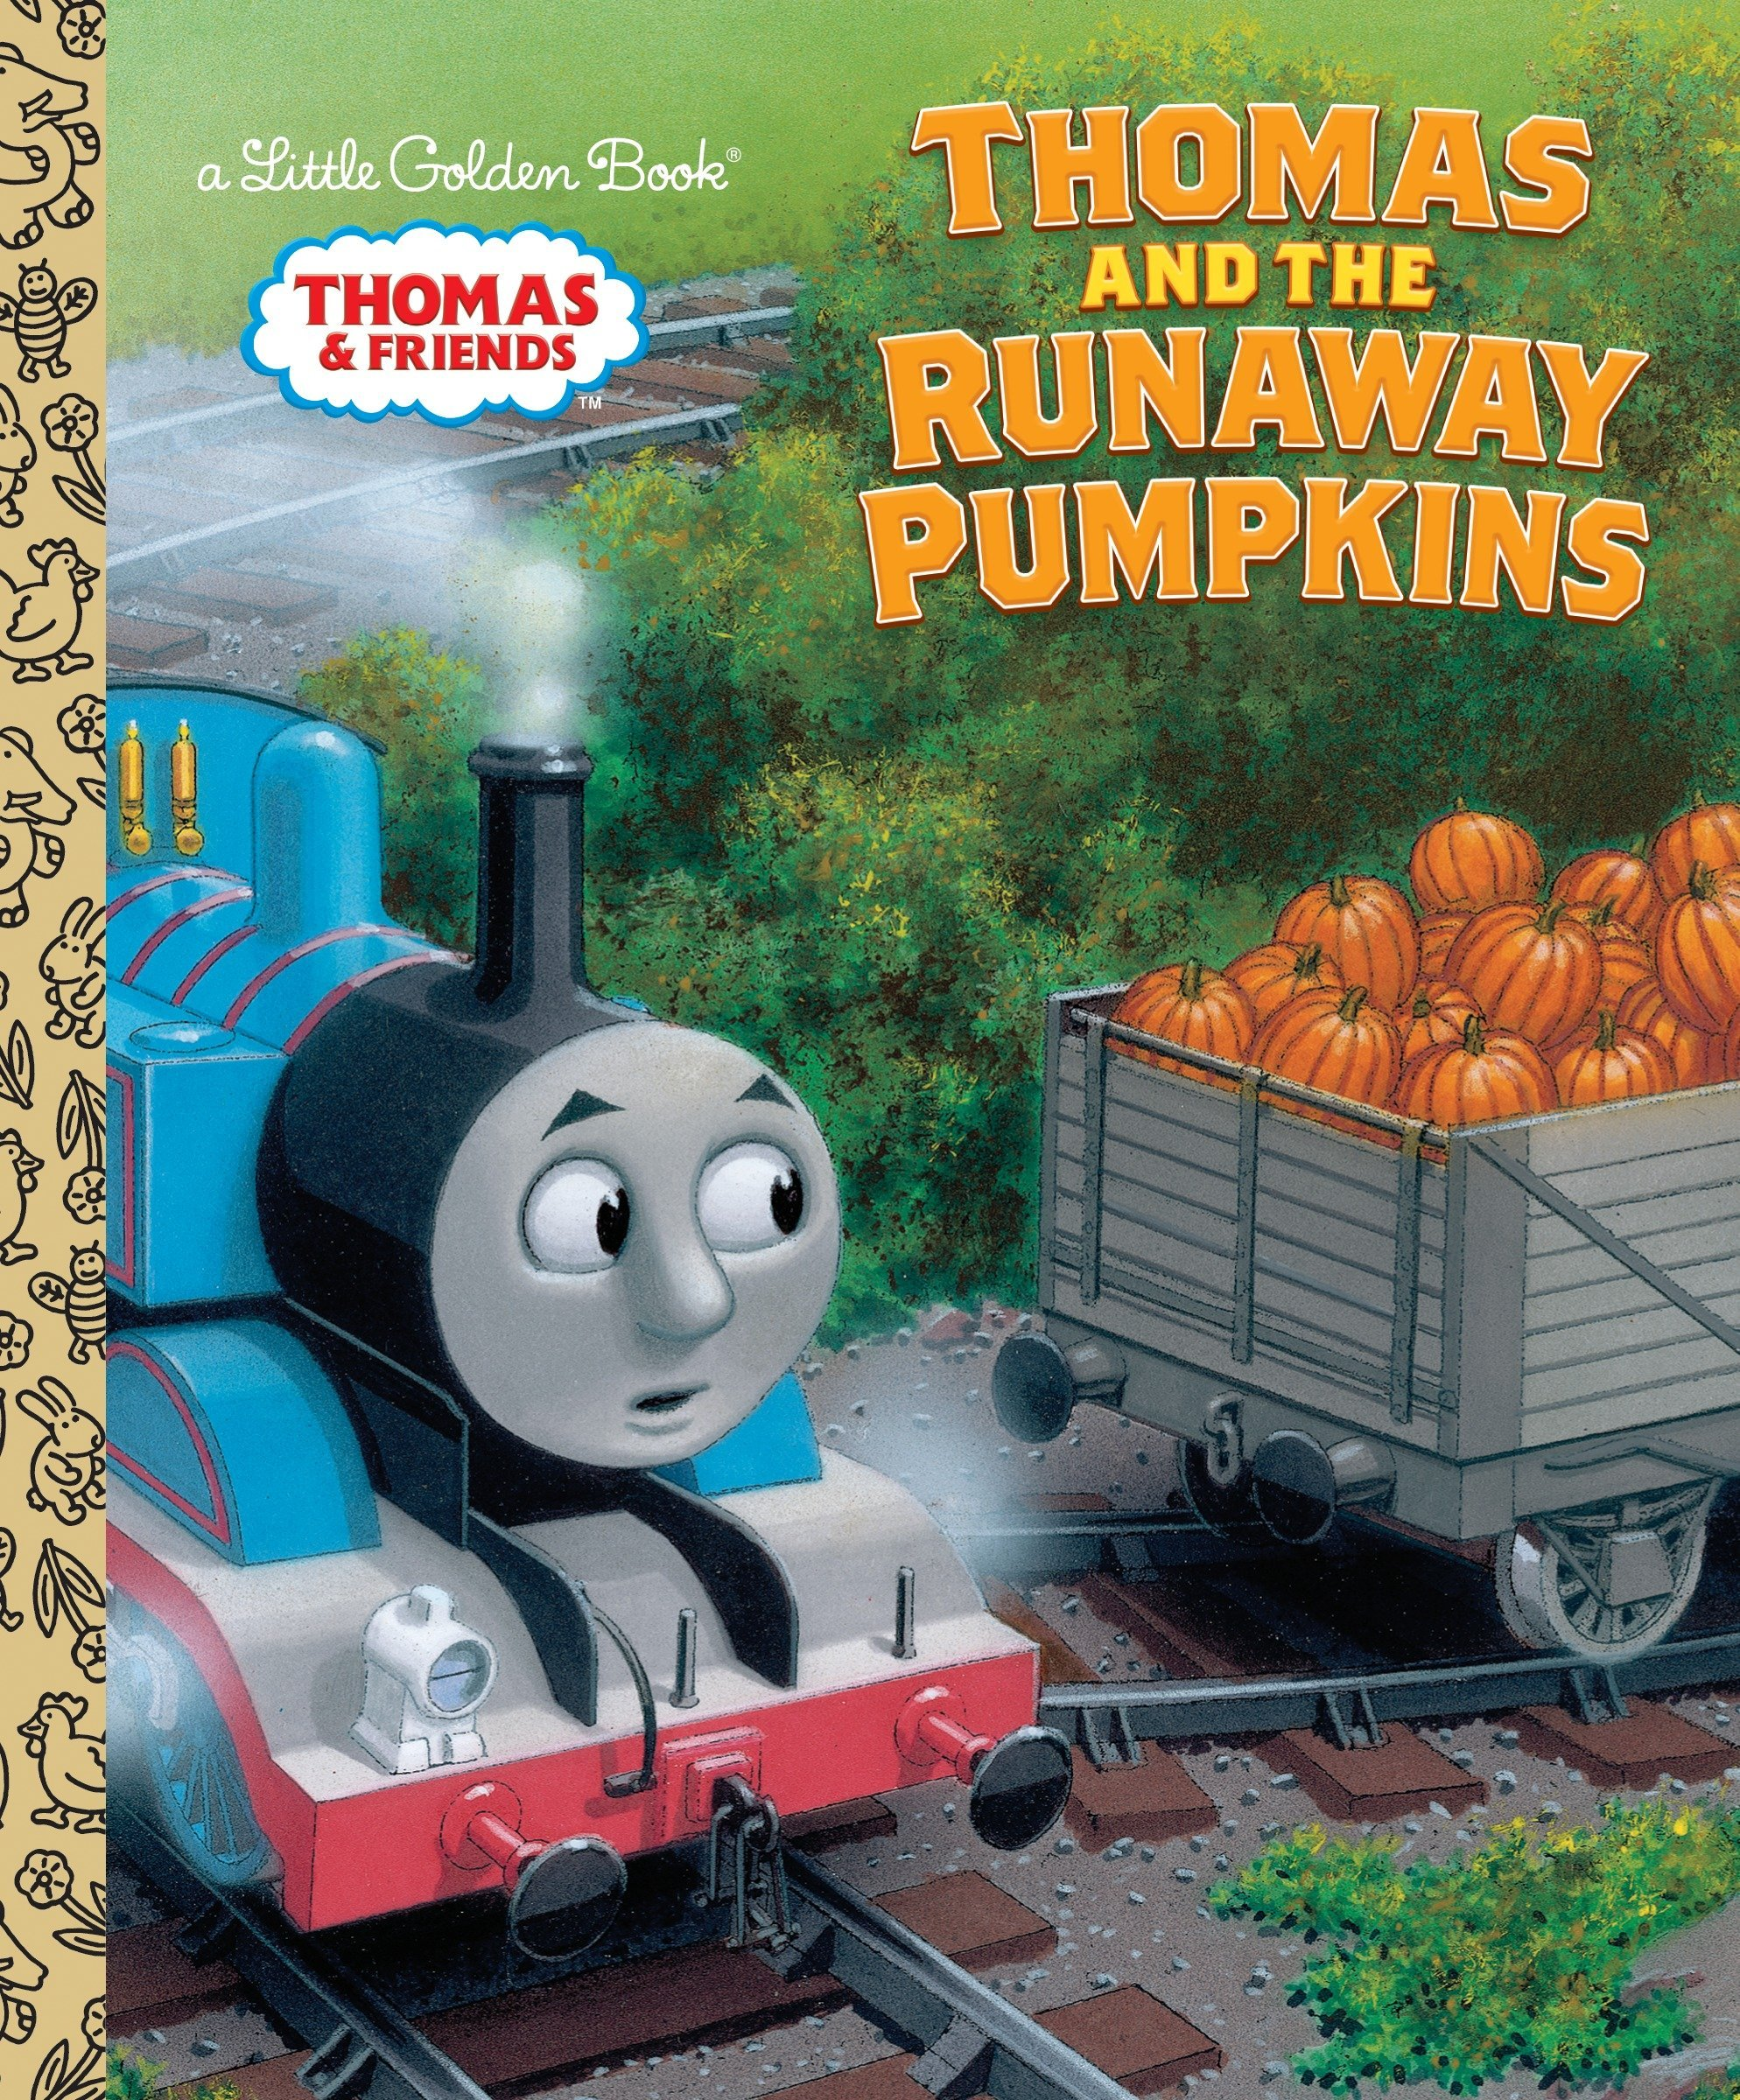 Thomas and the Runaway Pumpkins (Thomas & Friends) (Little Golden Book) Hardcover – July 31, 2018 Naomi Kleinberg Richard Courtney Golden Books 0385373910